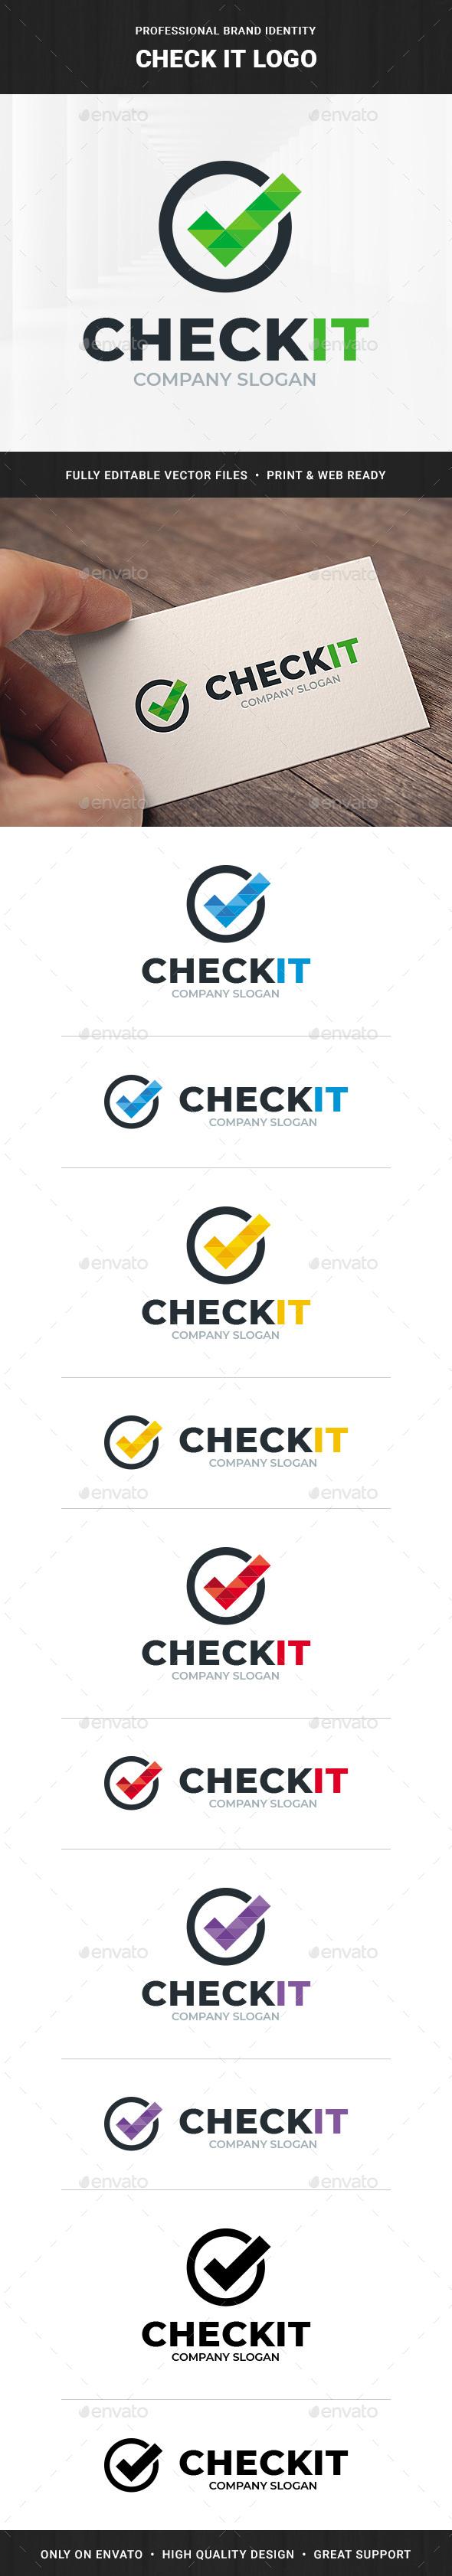 Check It Logo Template